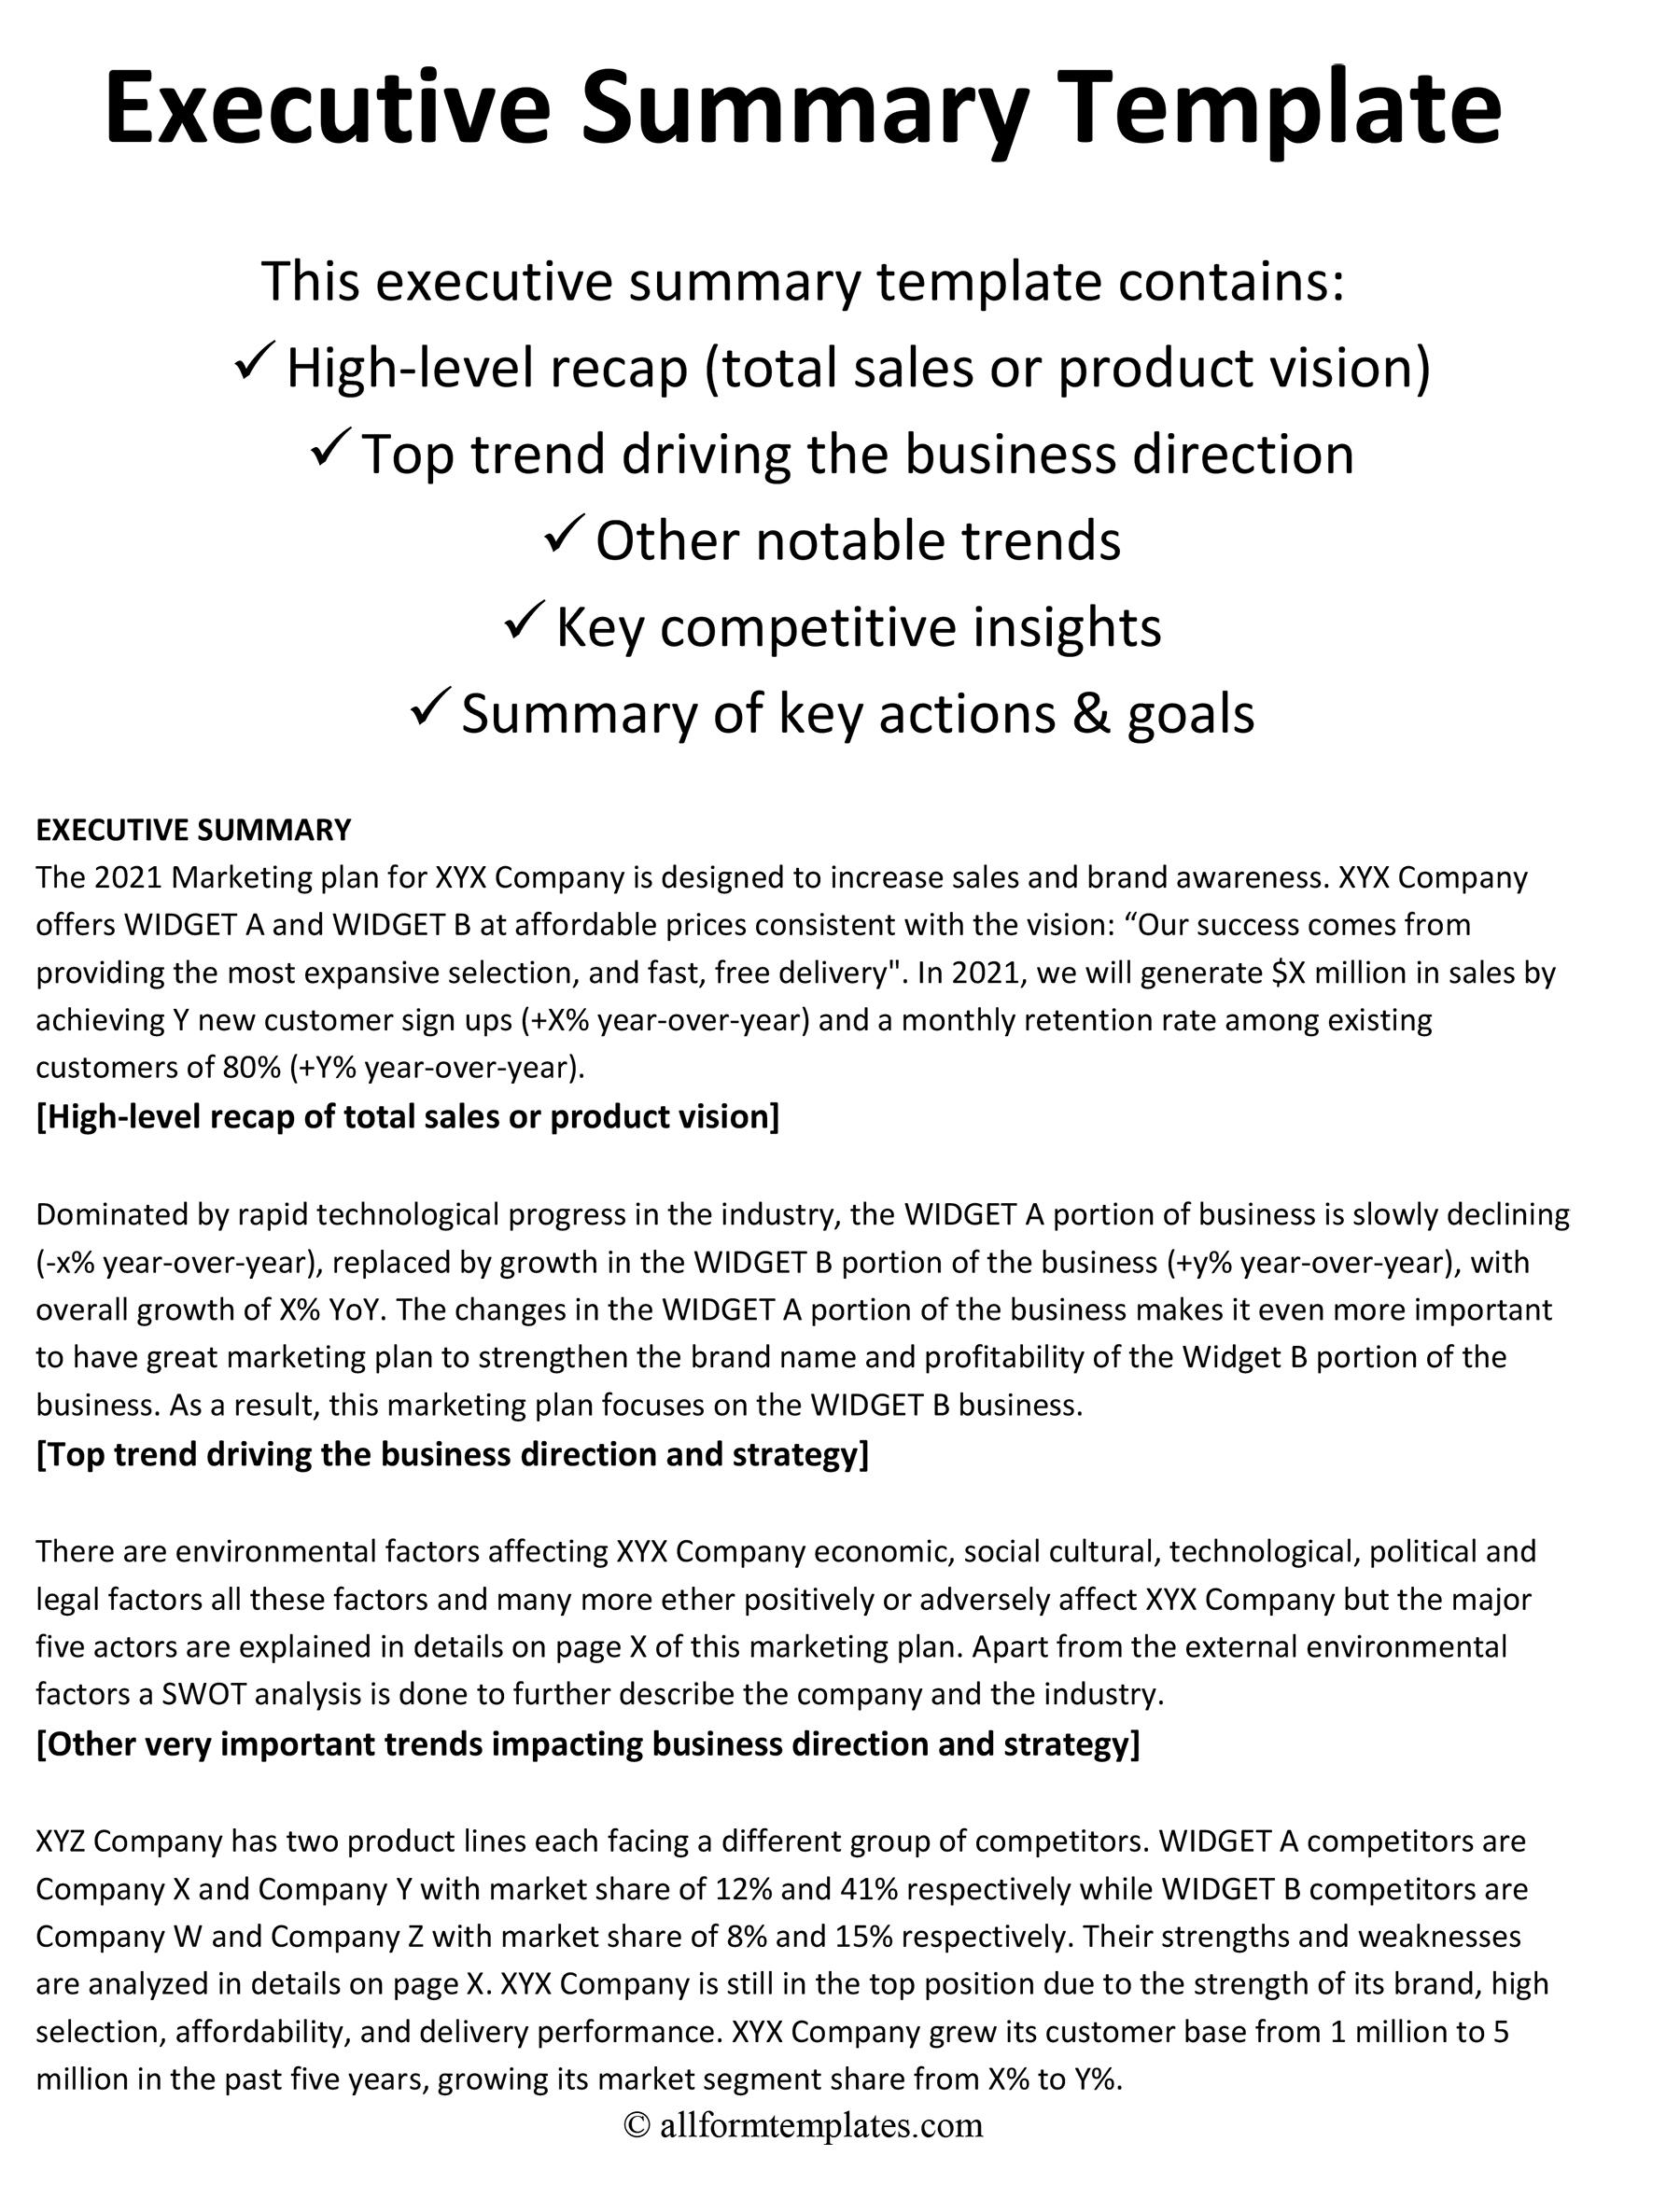 Executive-Summary-Templates-01-HD